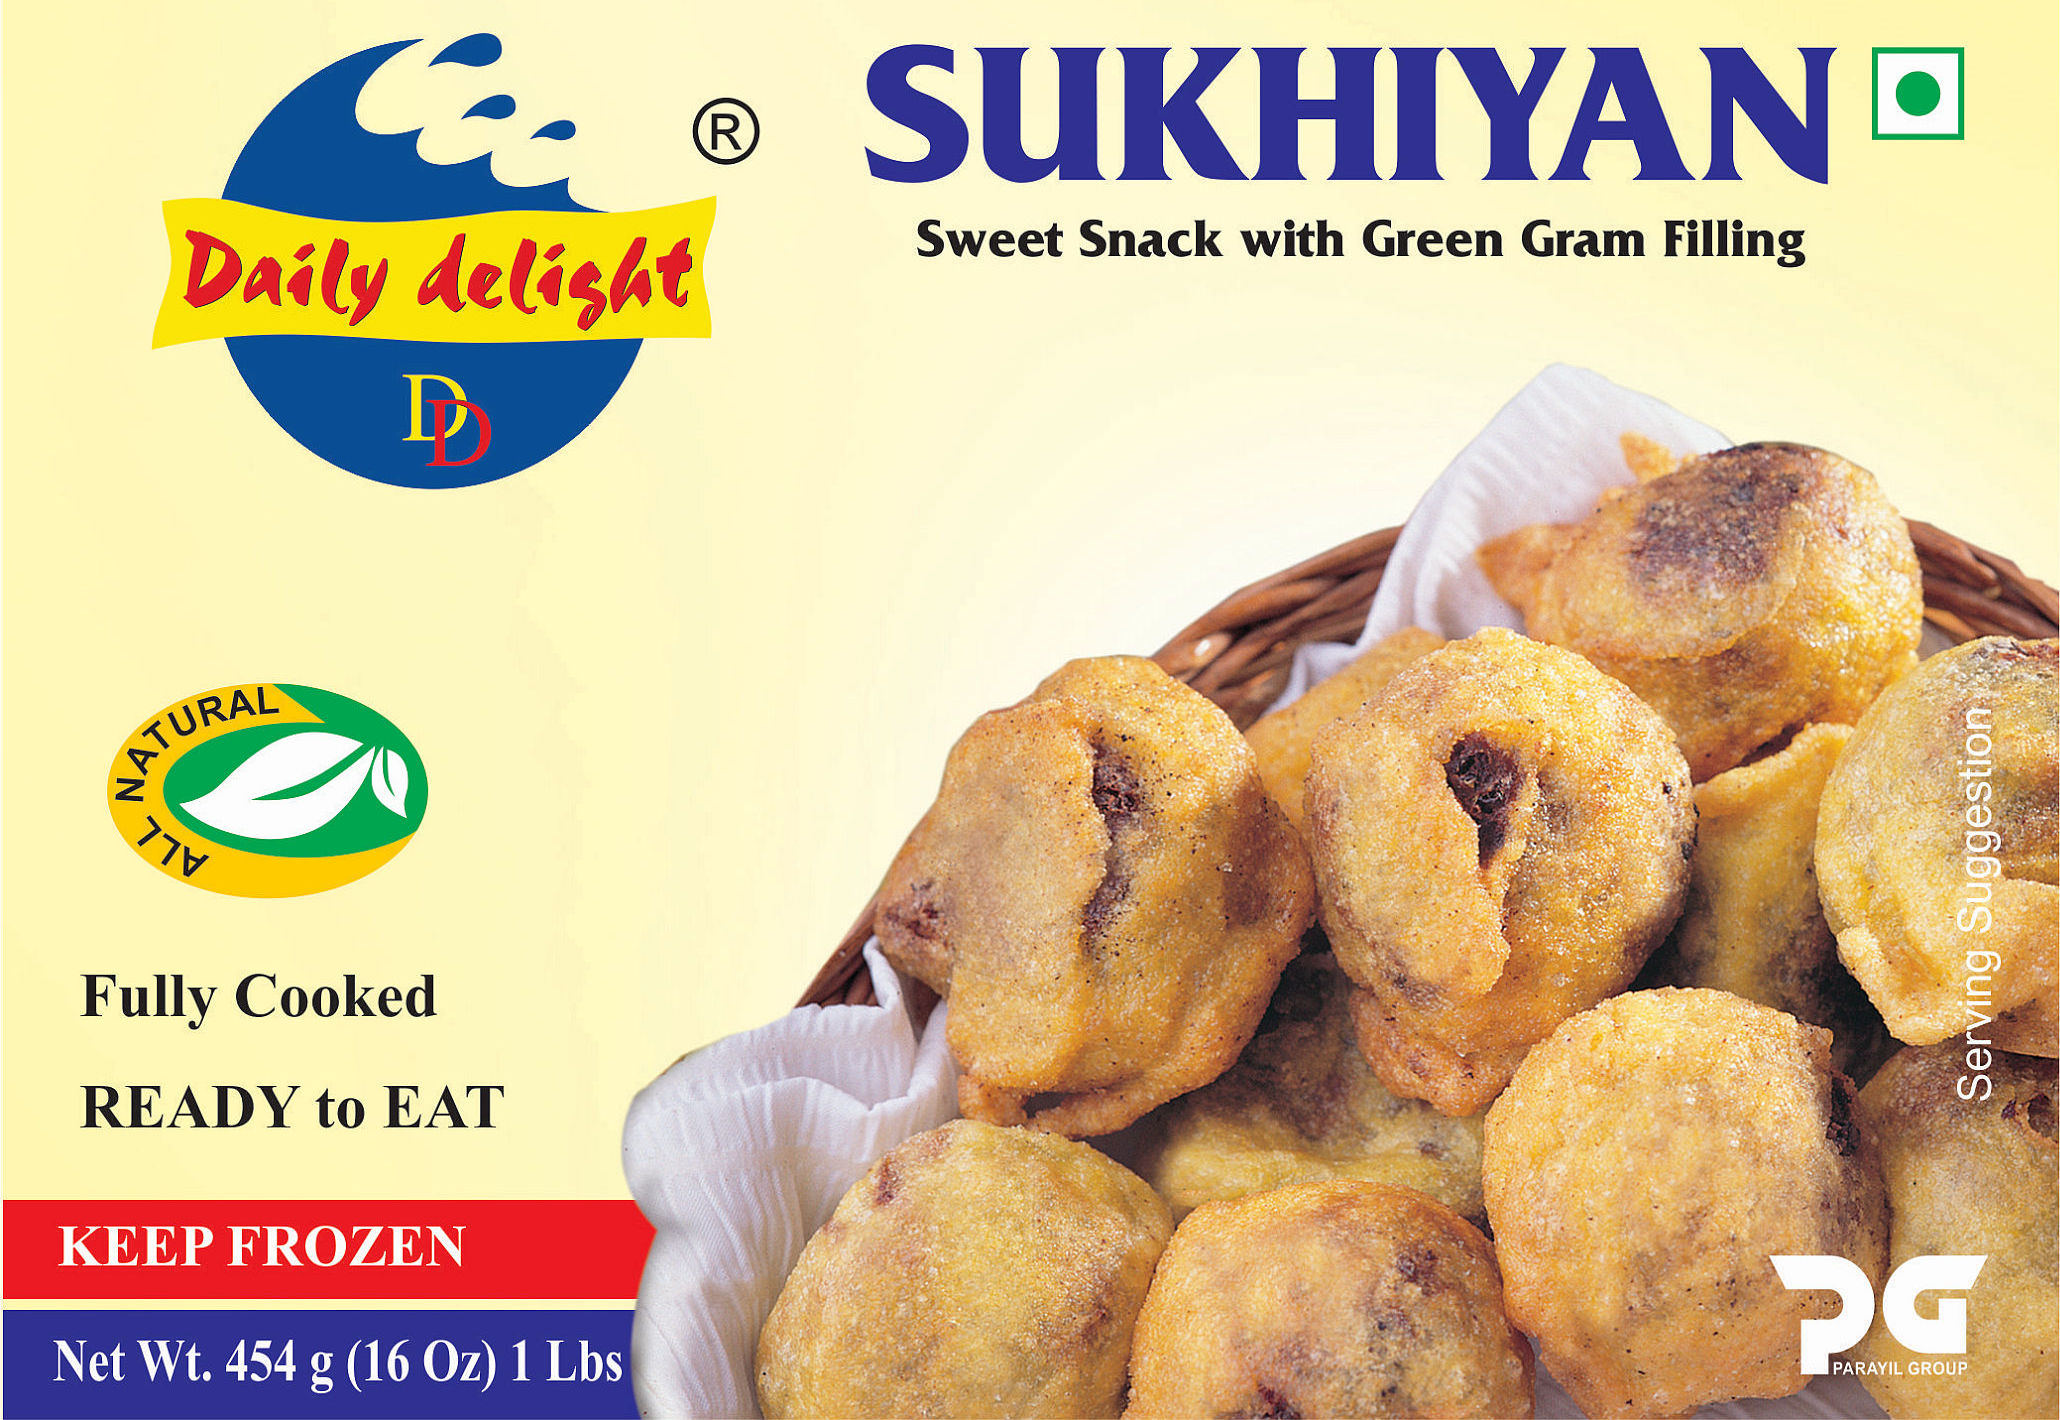 Daily Delight Sukhiyan